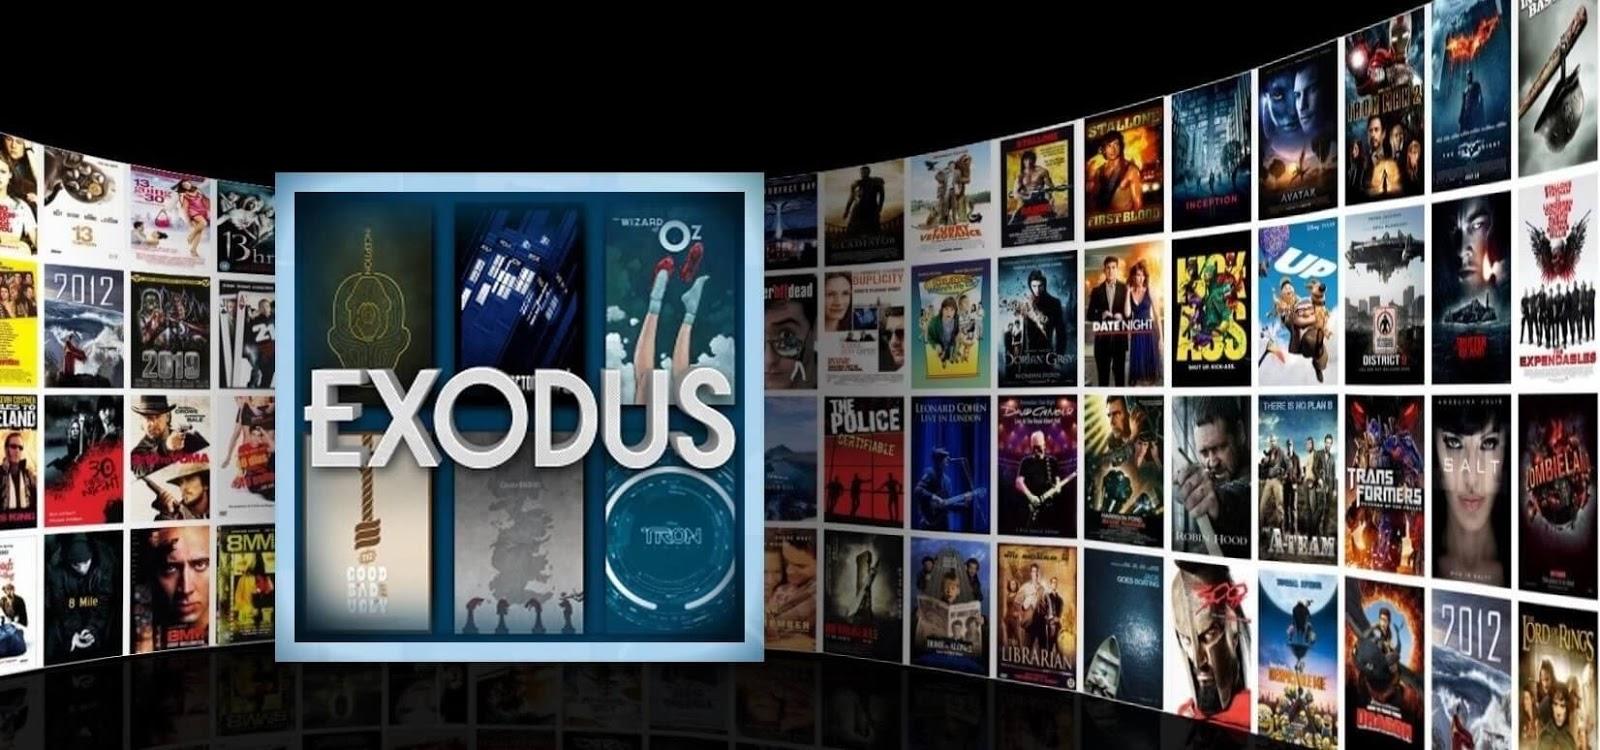 Kodi Exodus Alternative Trending in the Market